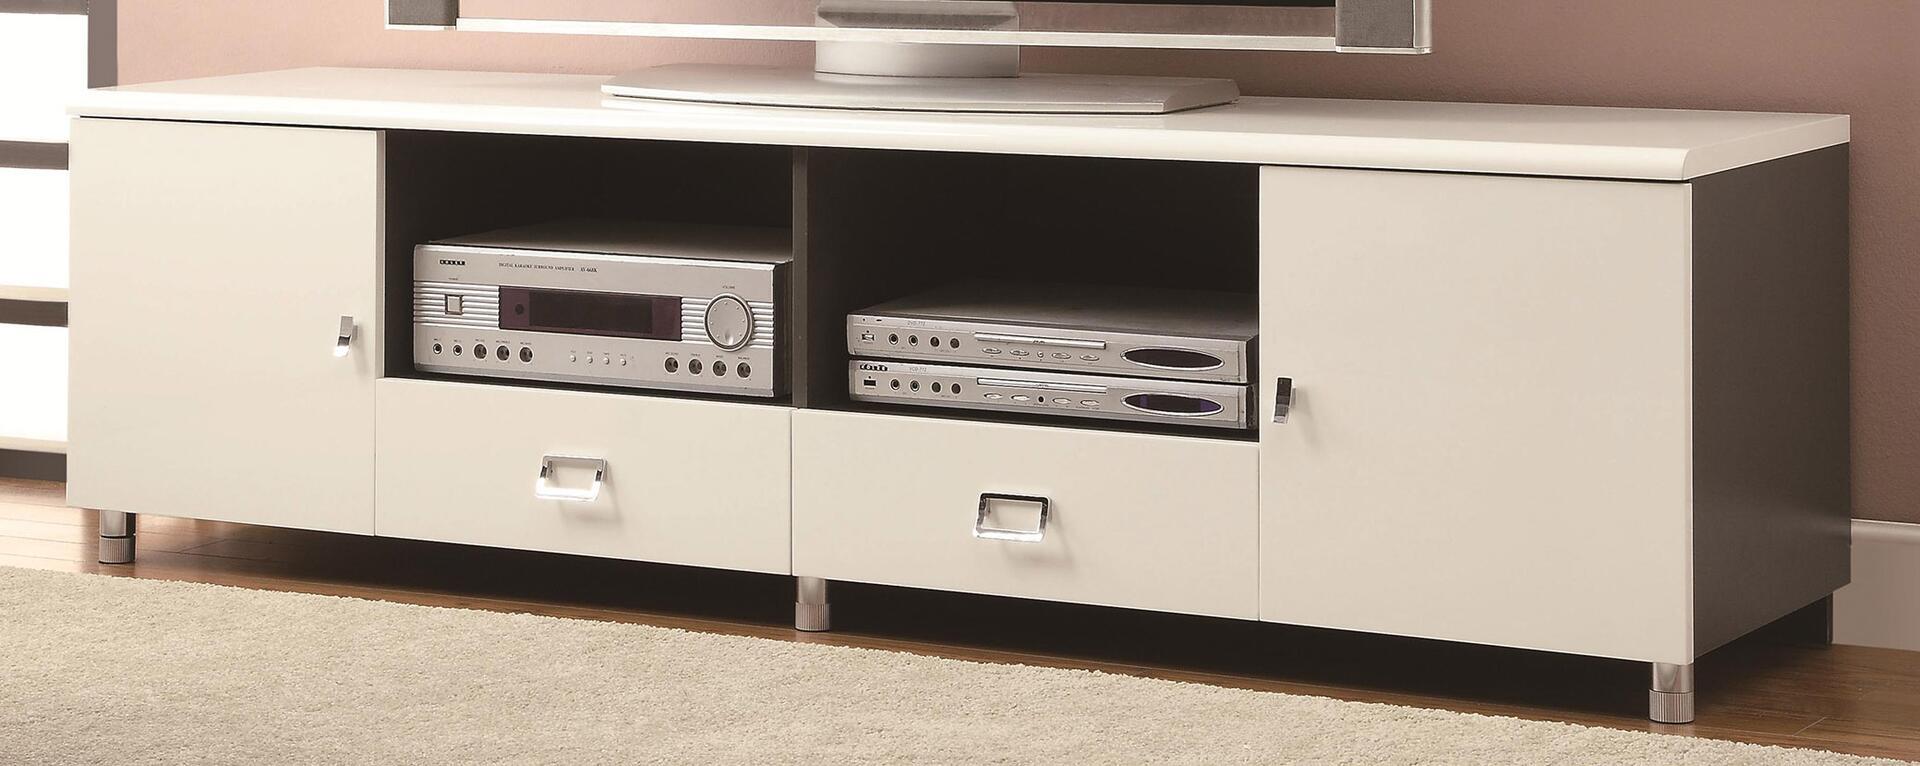 coaster 700910 appliances connection